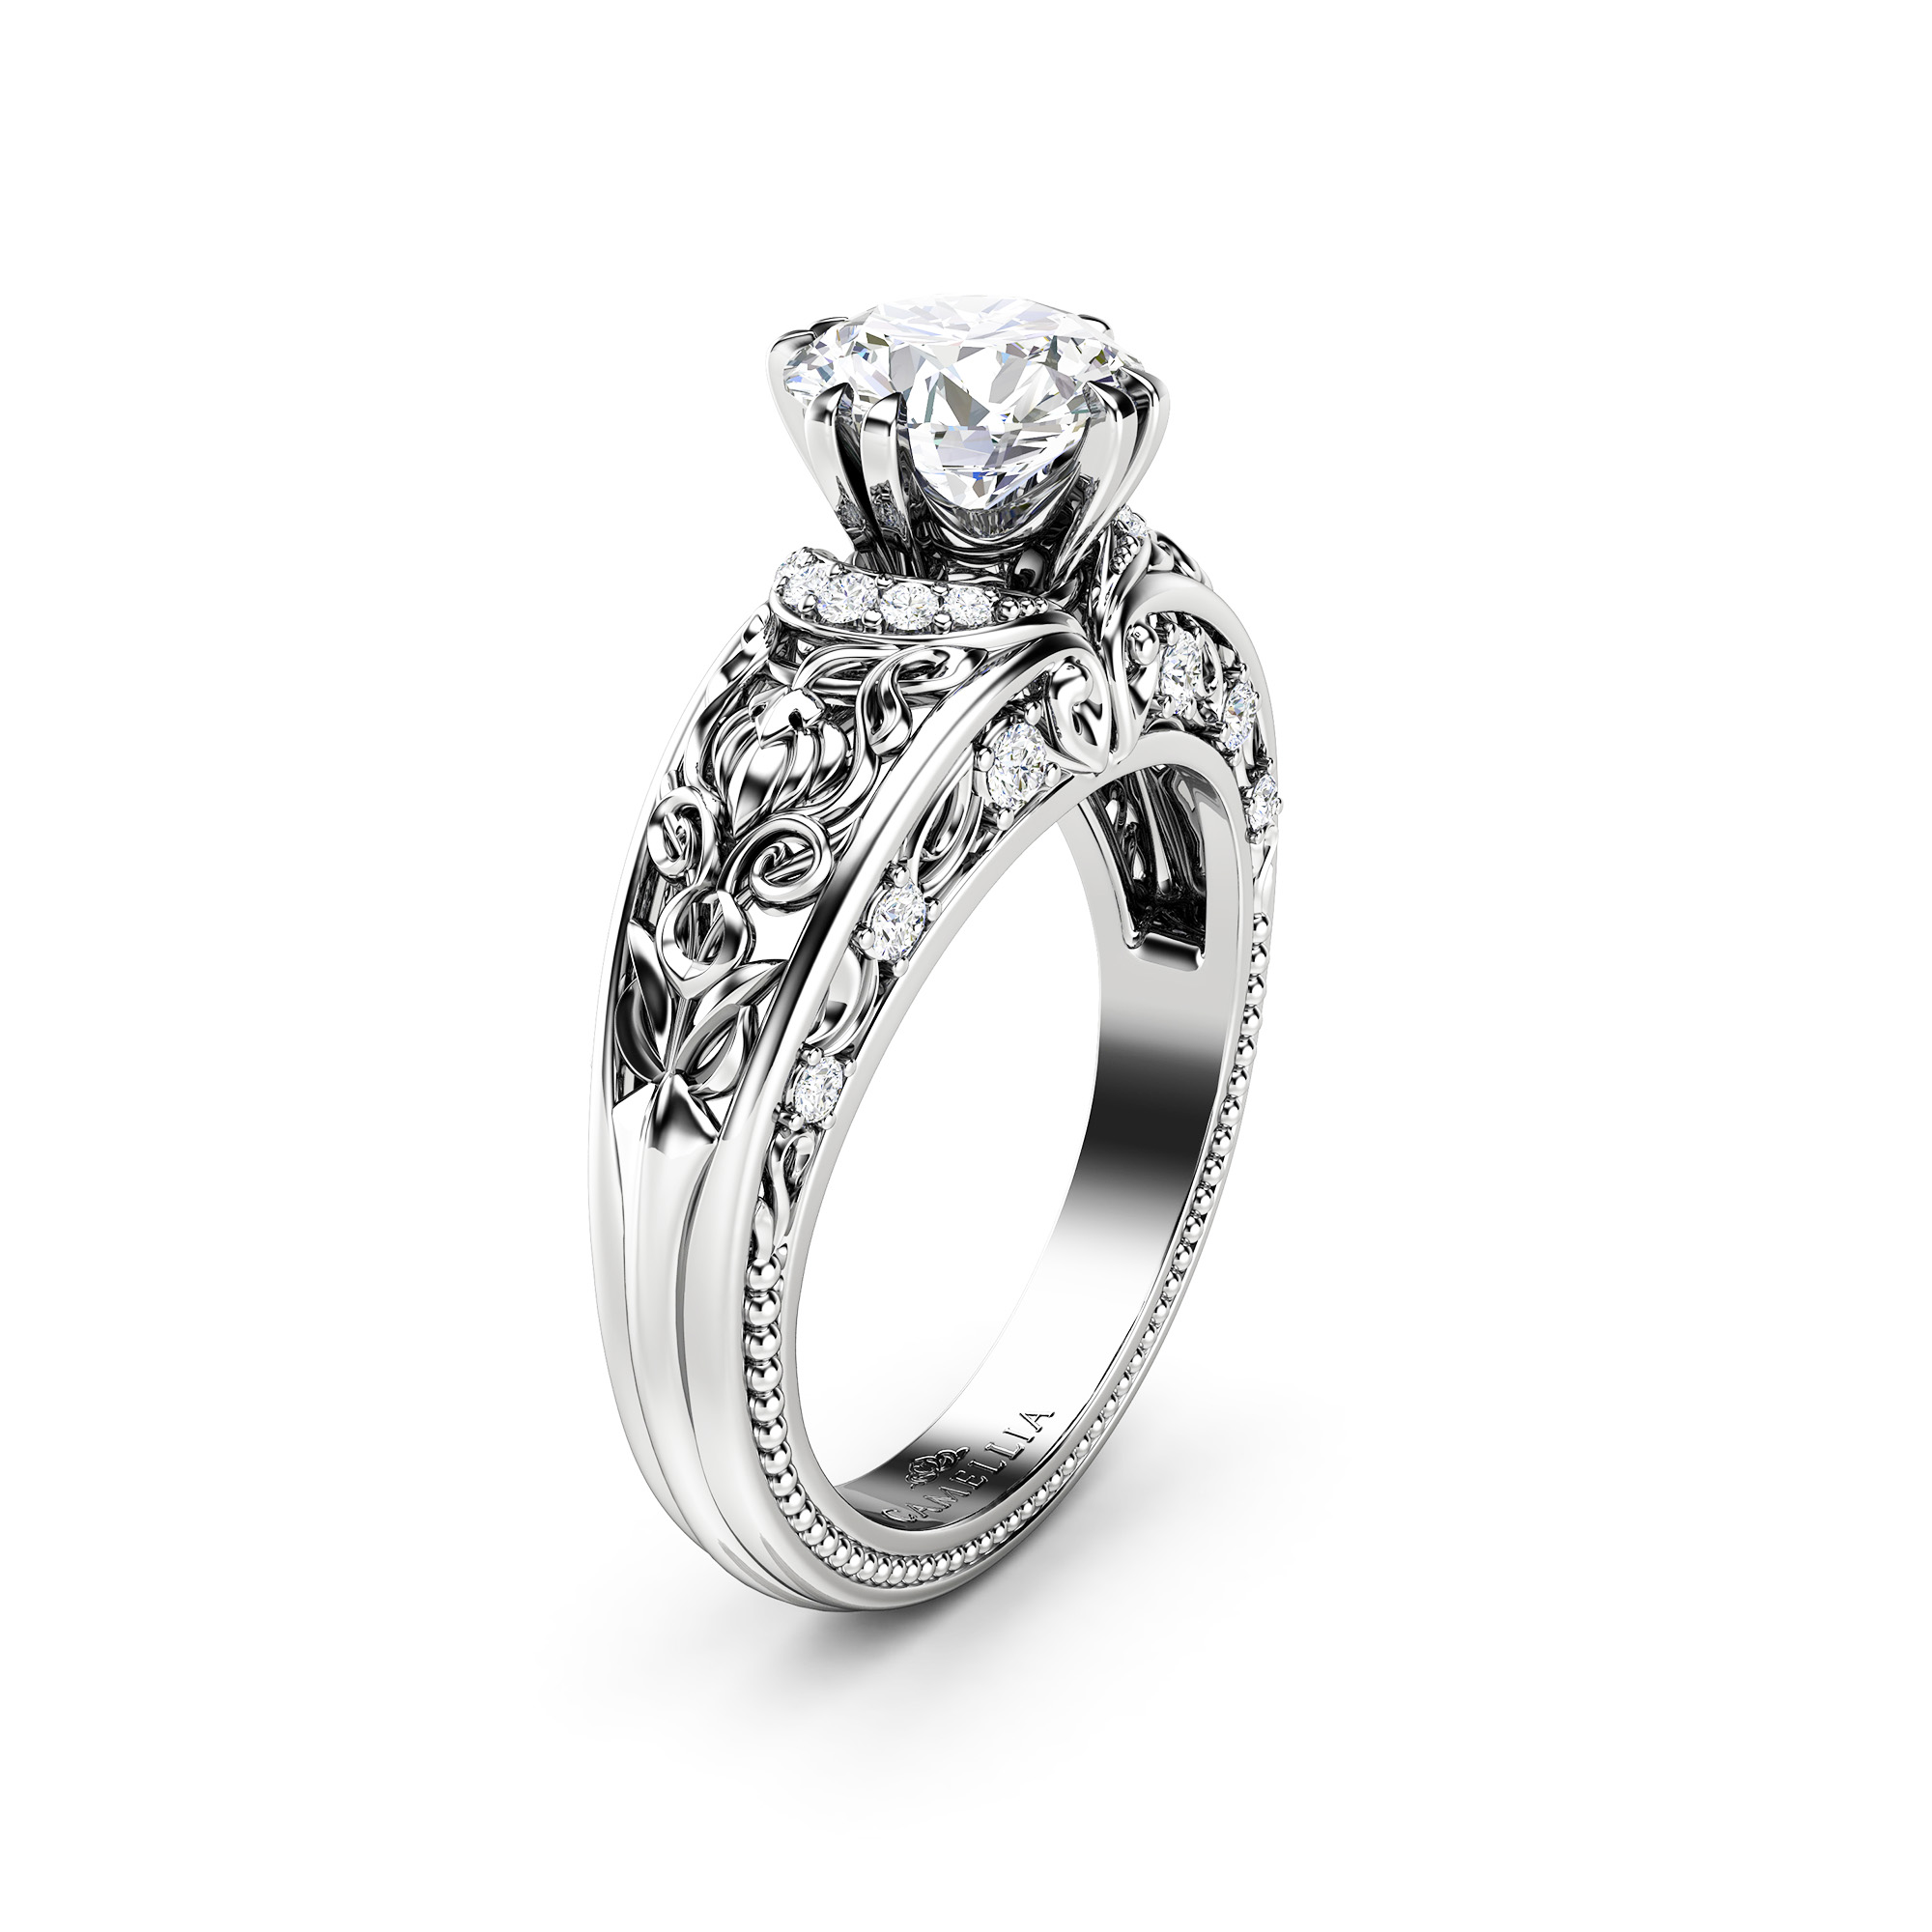 Round Moissanite Engagement Ring Forever One Moissanite Engagement Ring Solid White Gold Ring